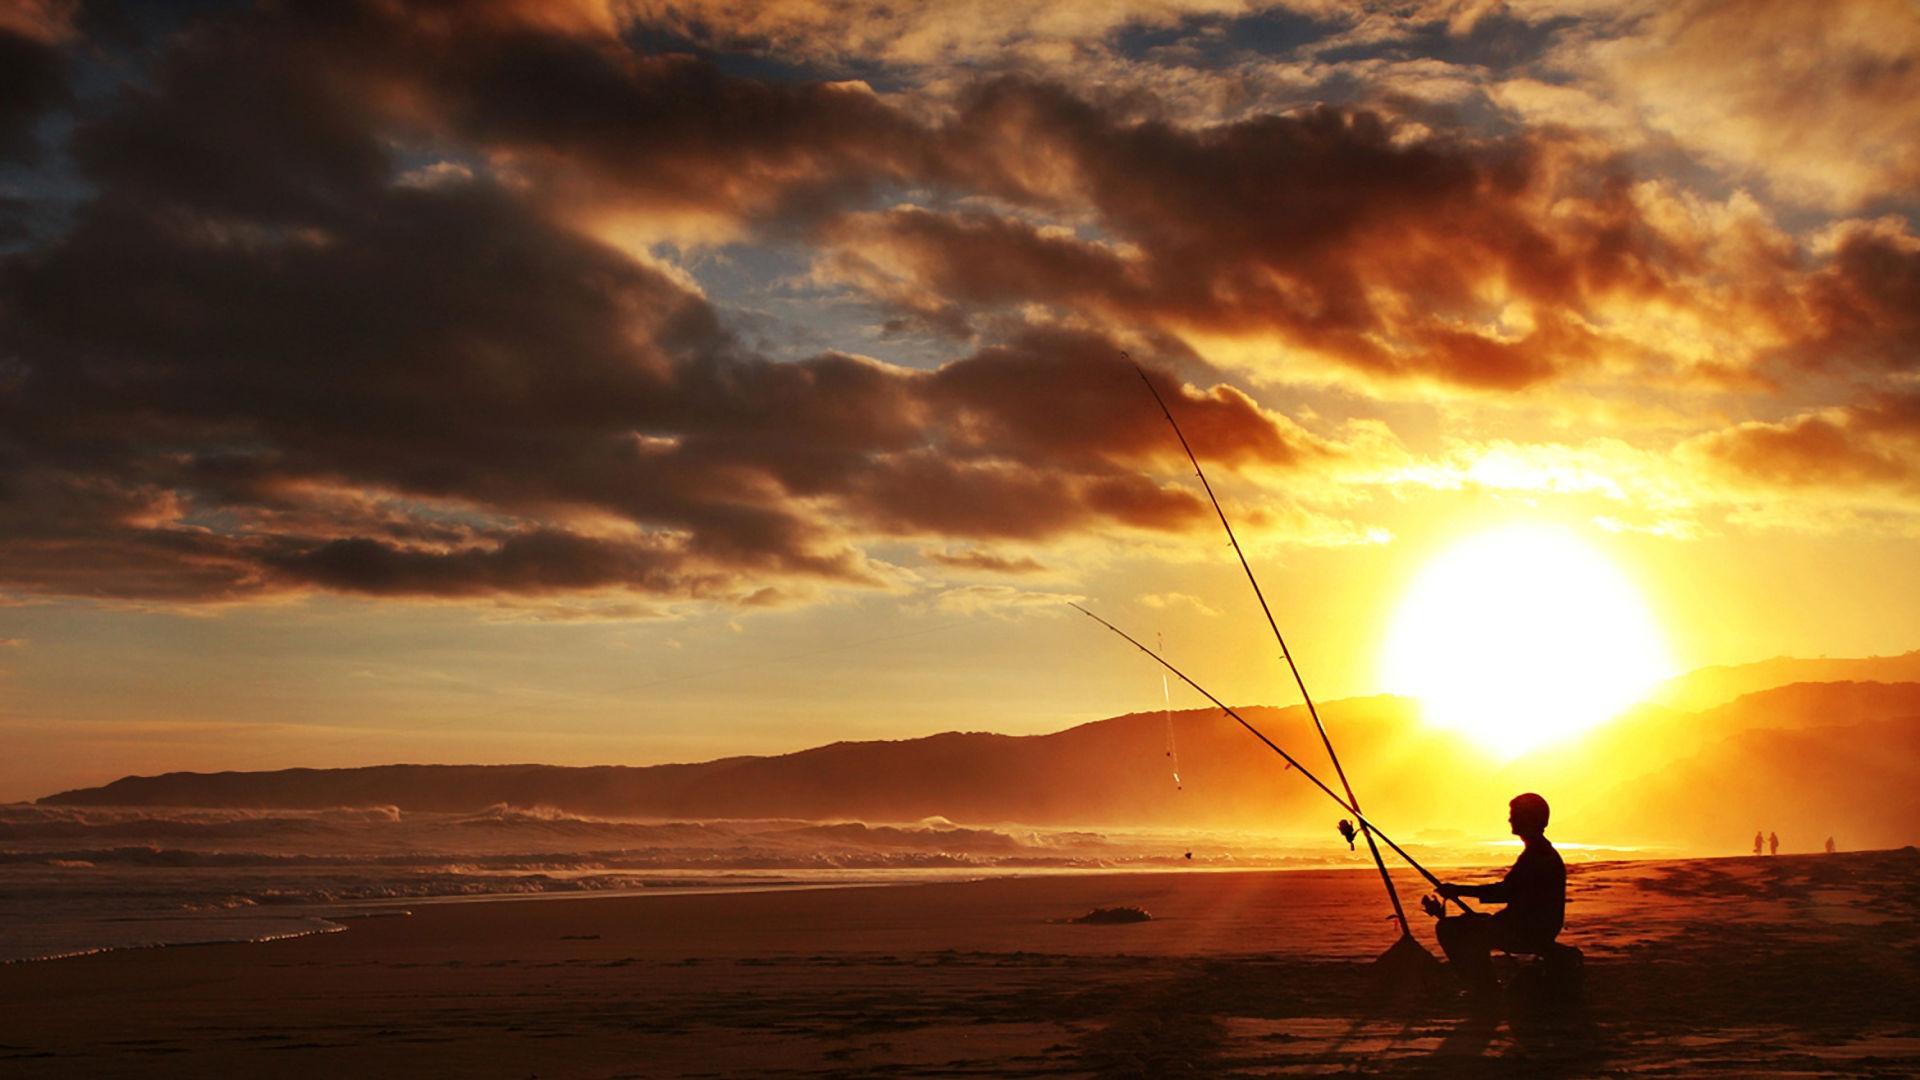 Man Fishing On Beach In Sunset Hd Wallpaper Wallpaper List 1920x1080